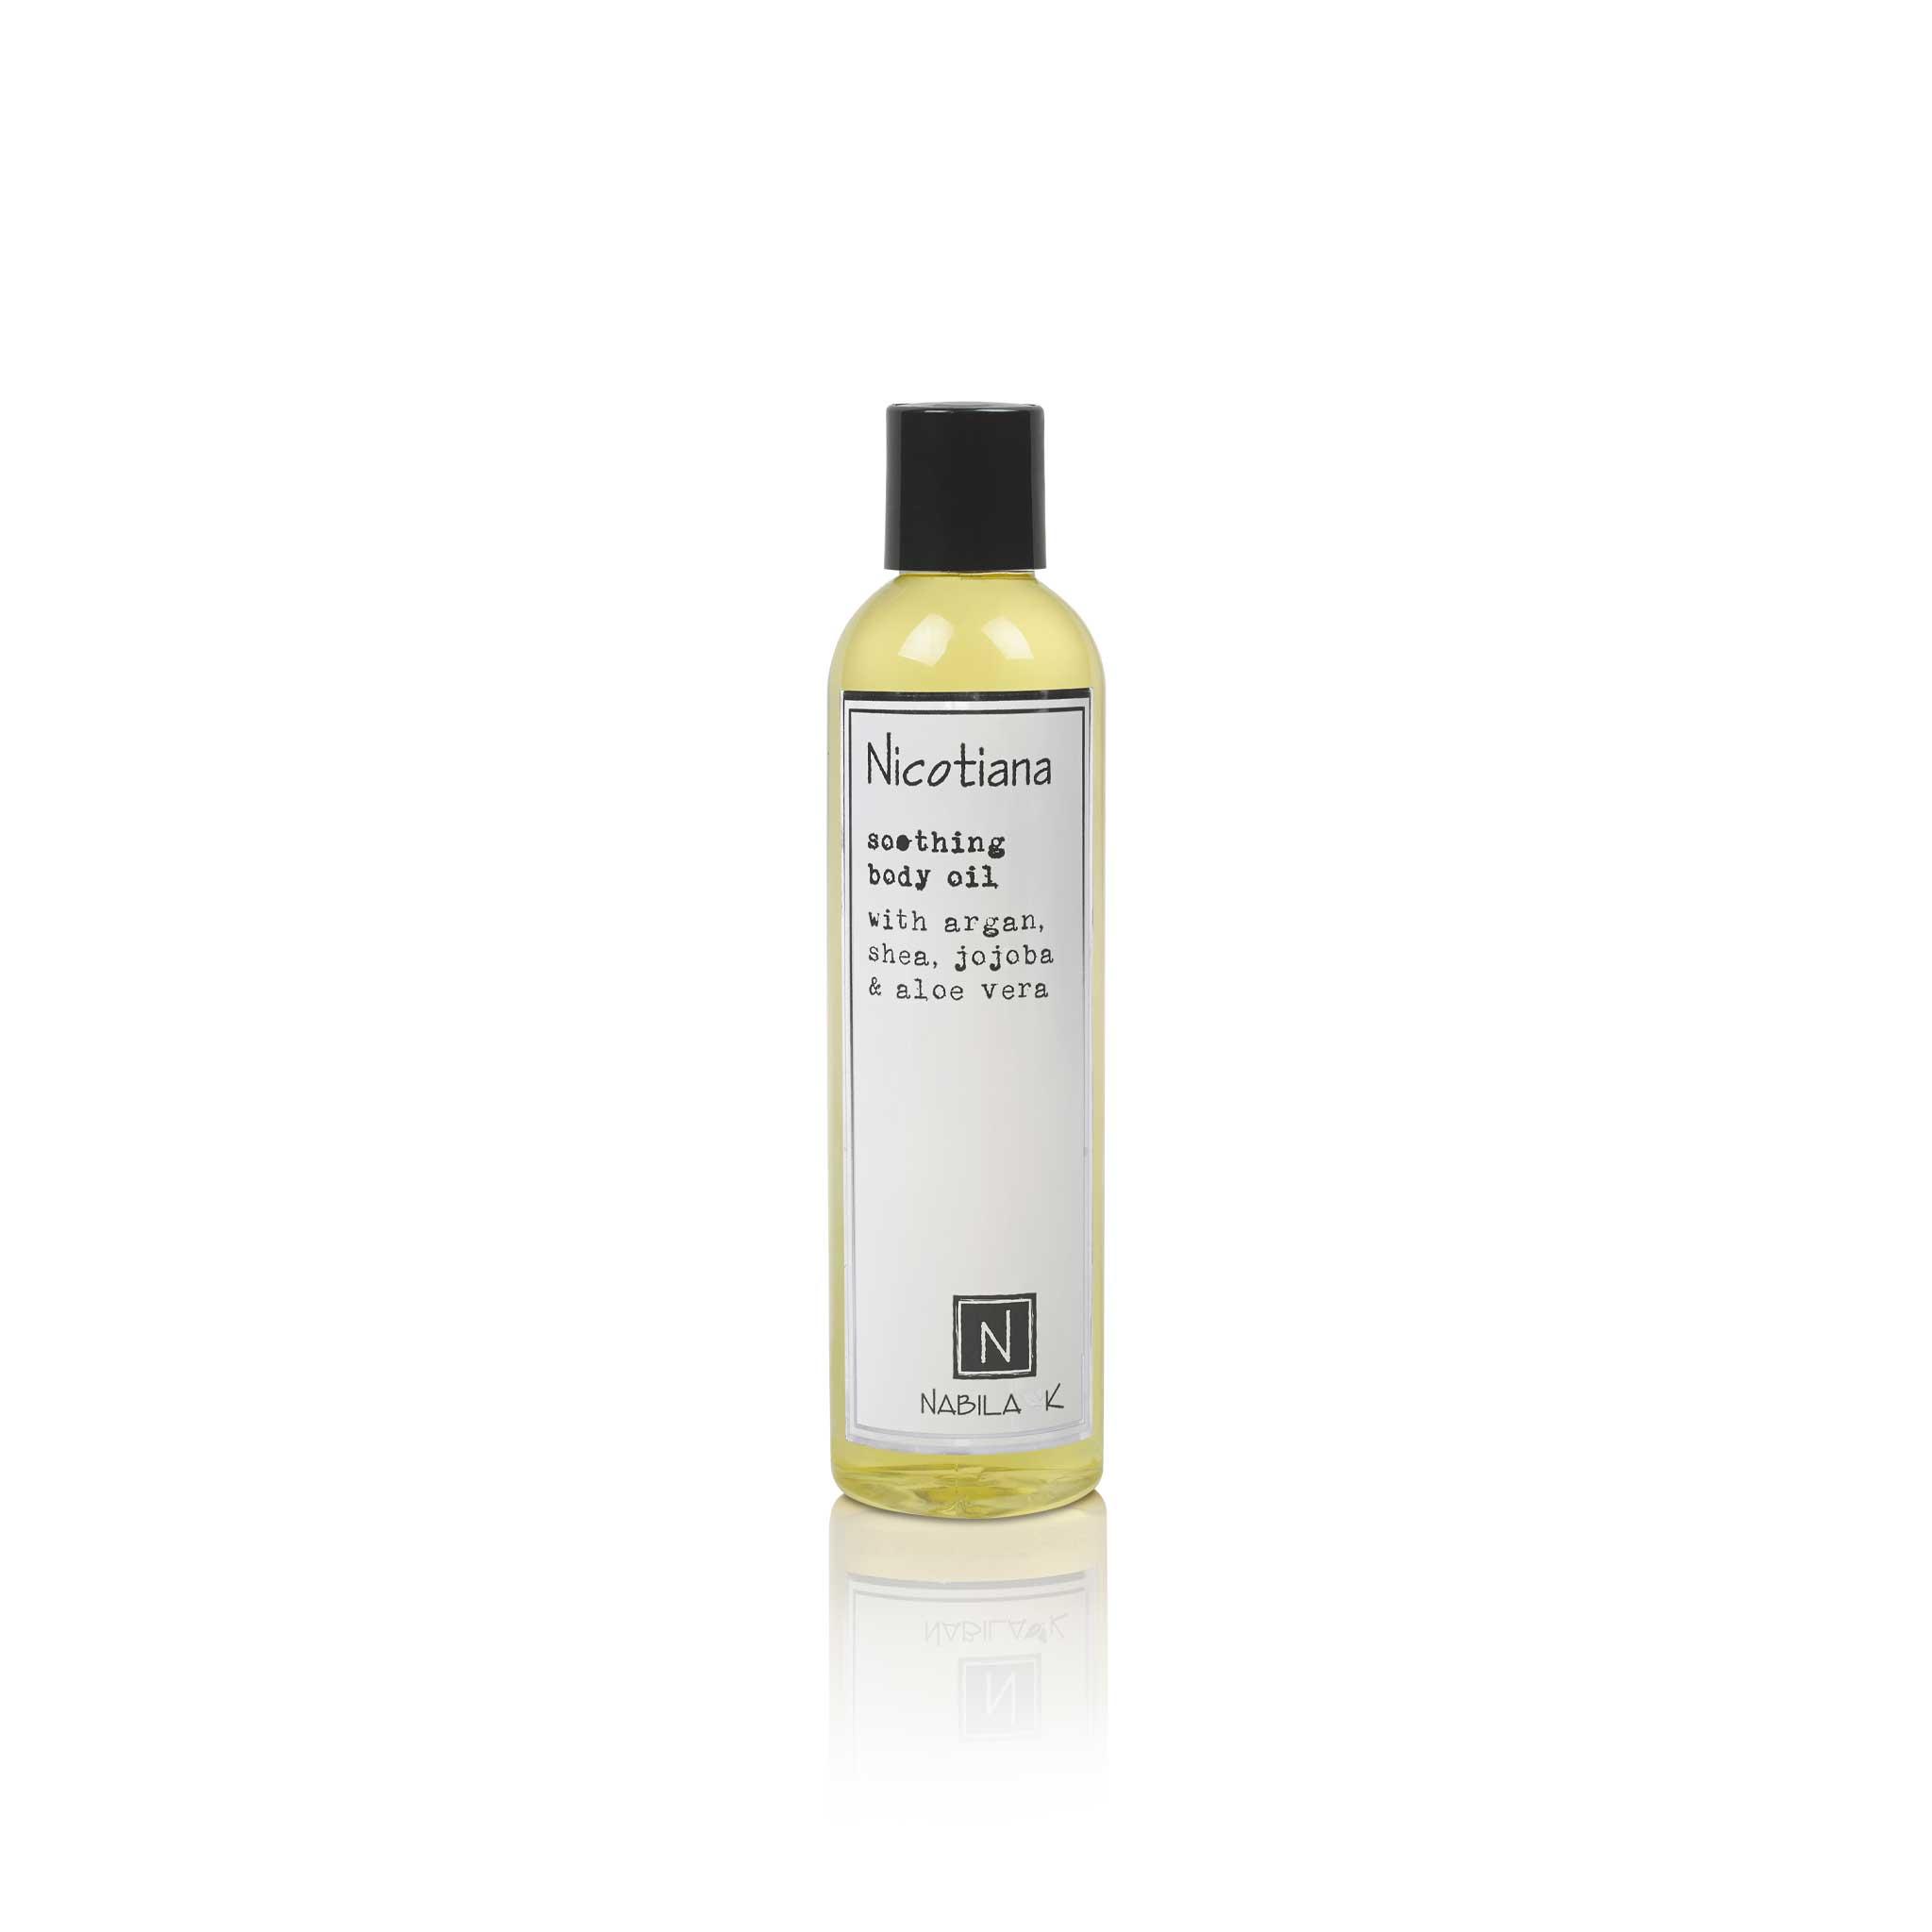 1 9oz bottle of nabila k's nicotiana soothing body oil with argan, shea, jojoba, and aloe vera